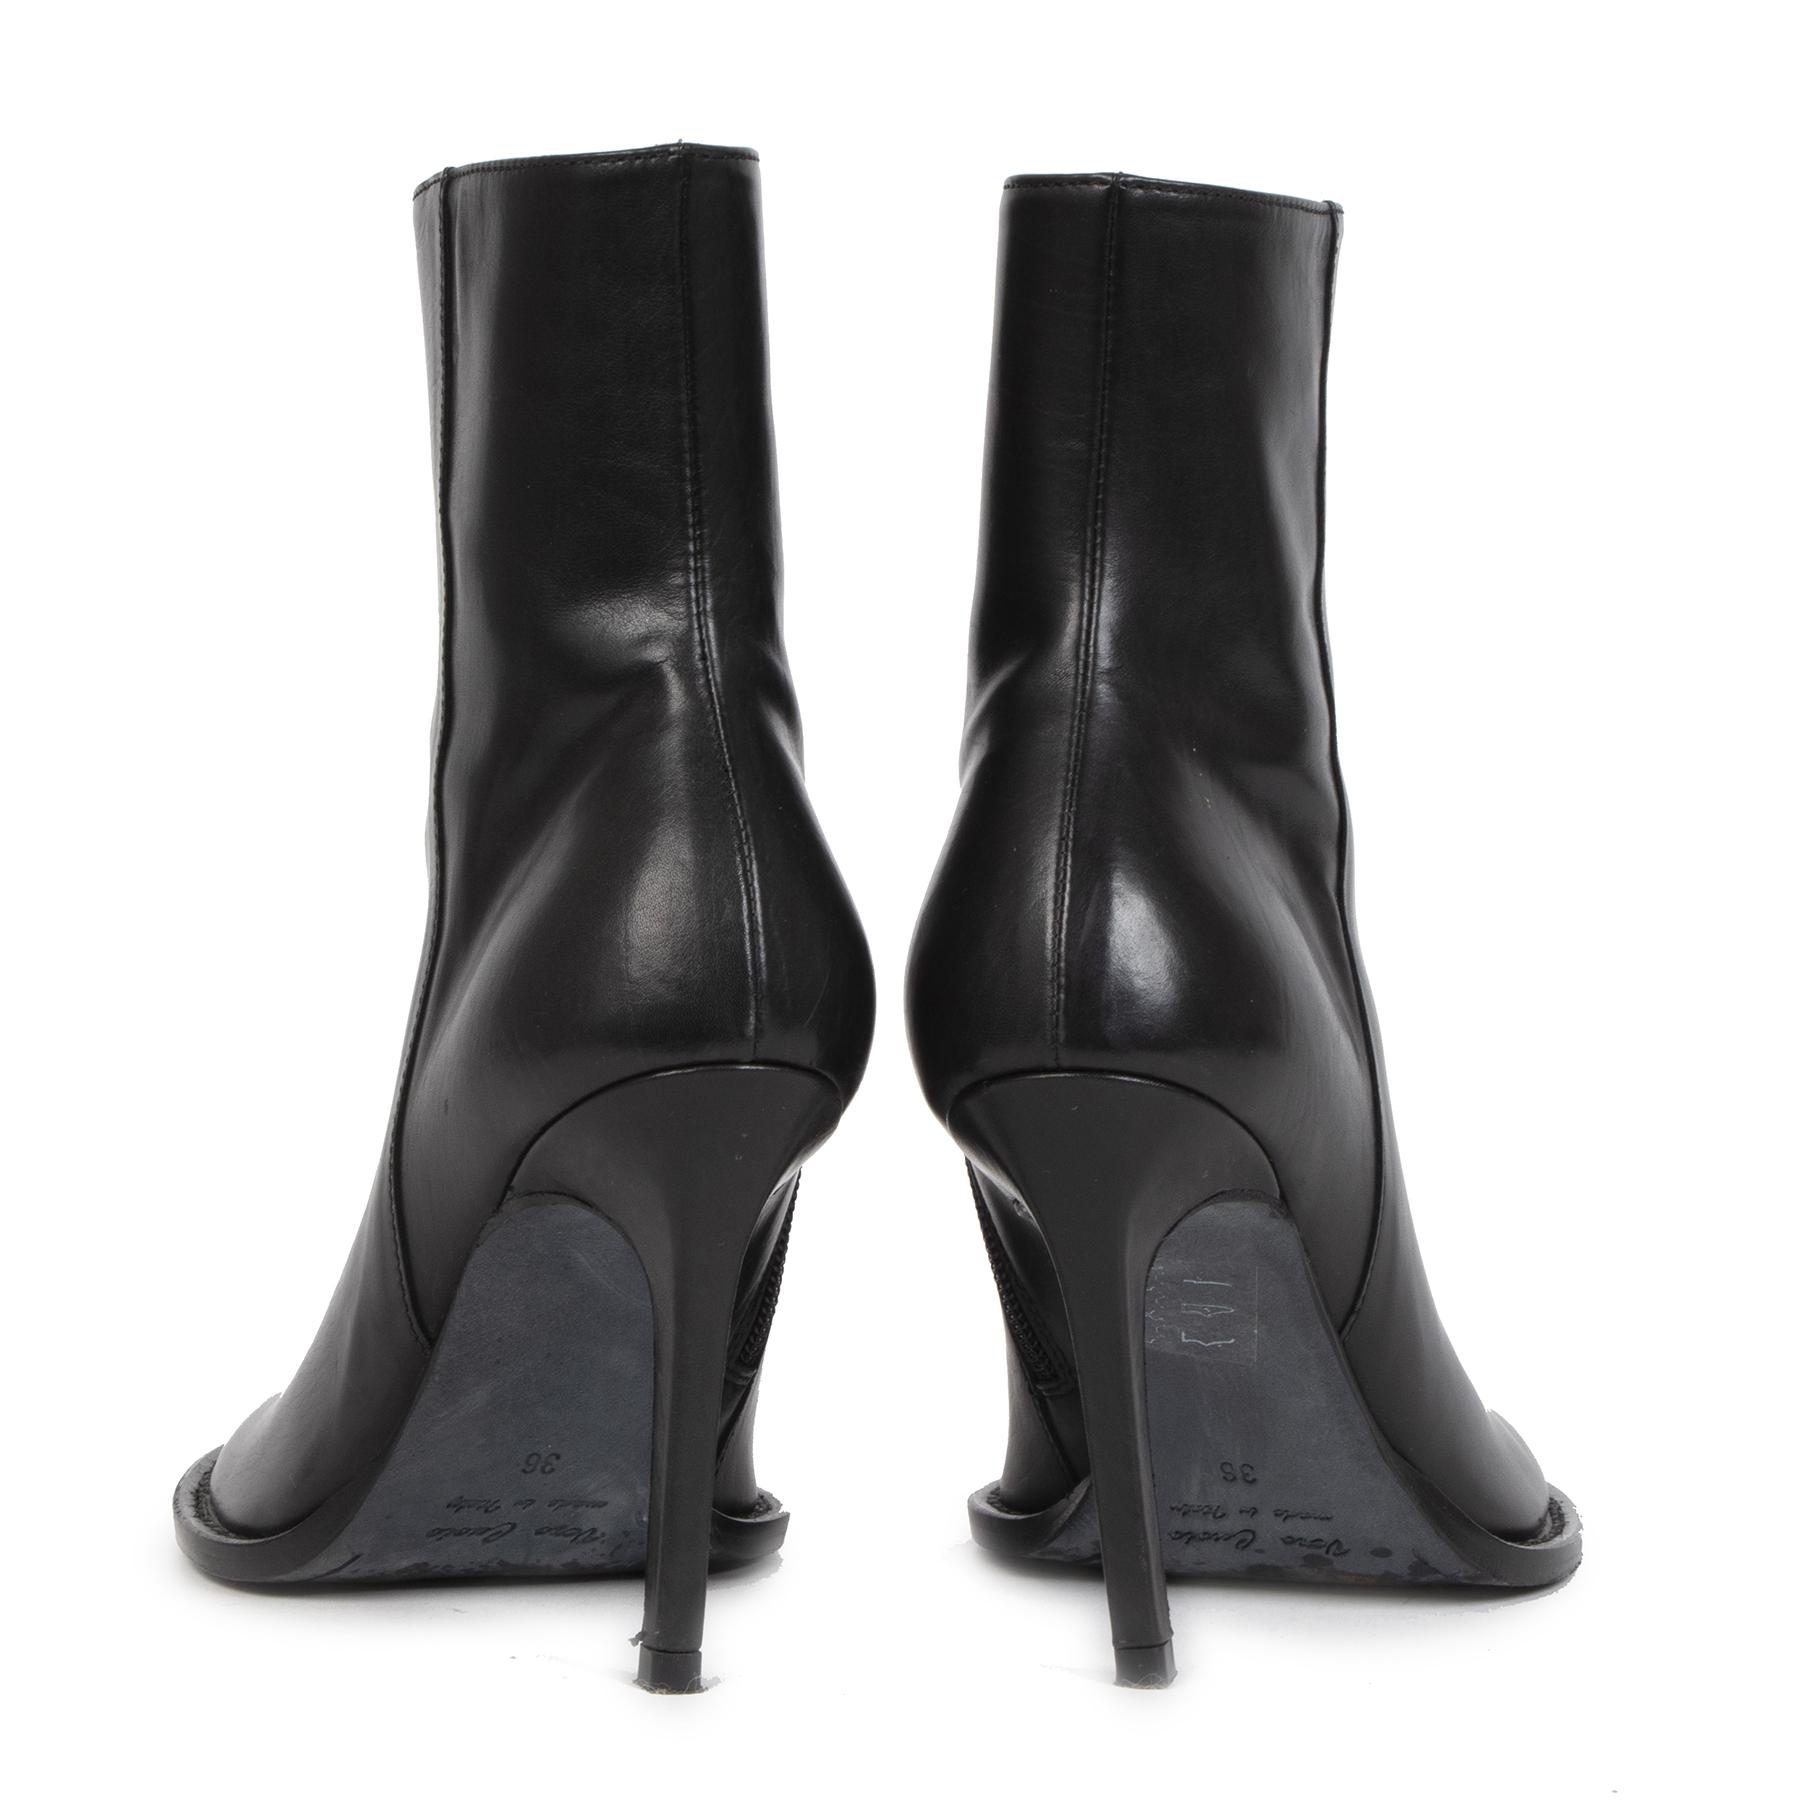 Authentieke tweedehands vintage Ann Demeulemeester Black Heeled Boots - Size 36 koop online webshop LabelLOV